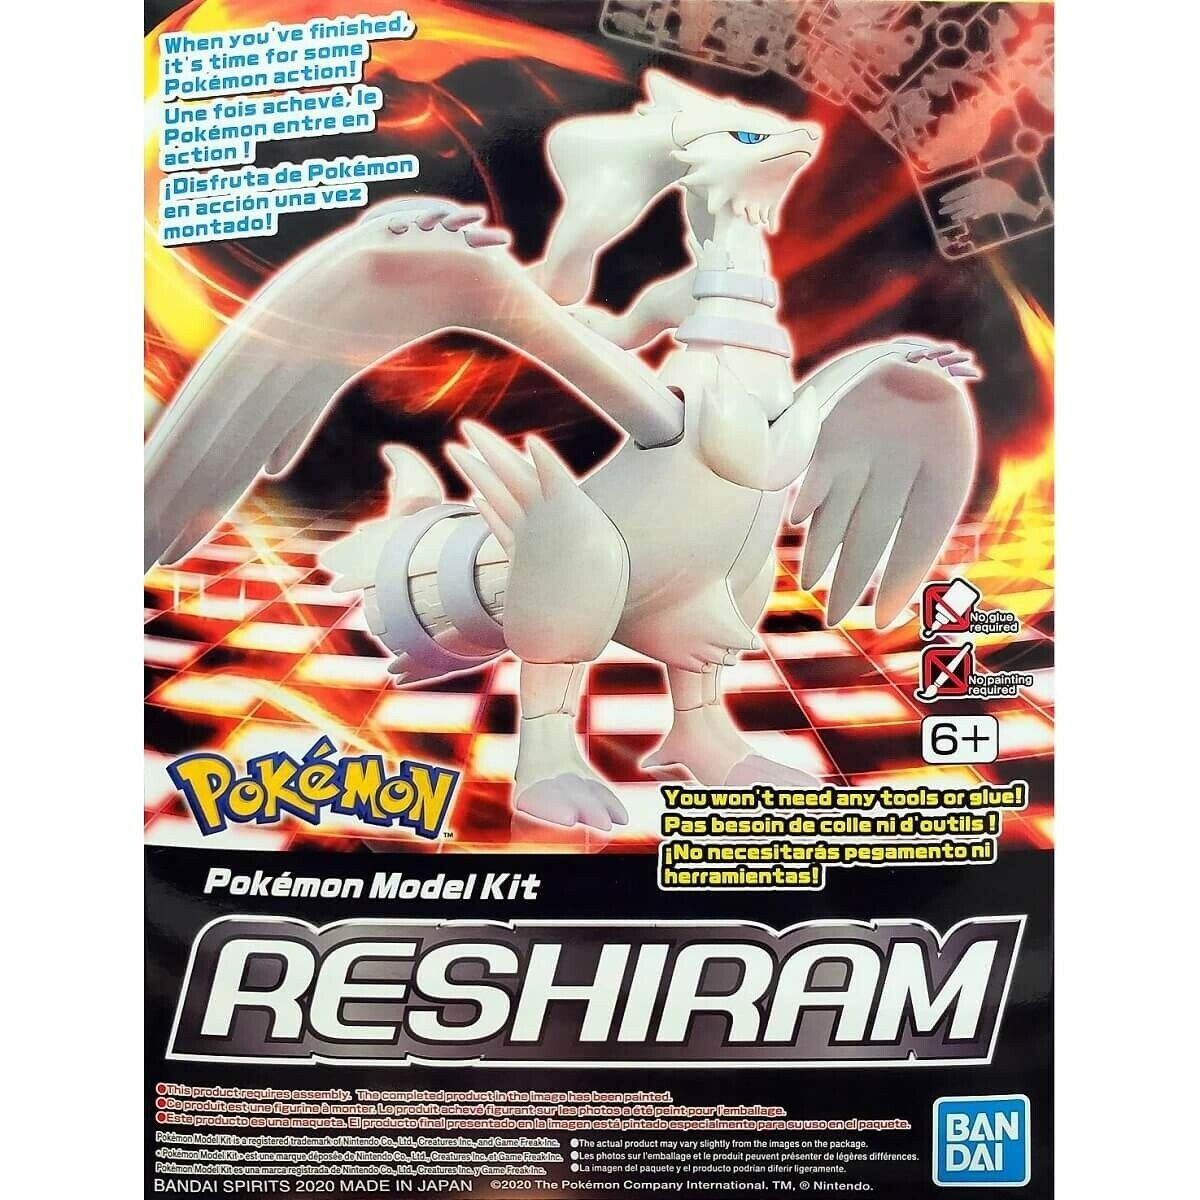 Bandai Spirits Pokemon Model Kit #13 Reshiram